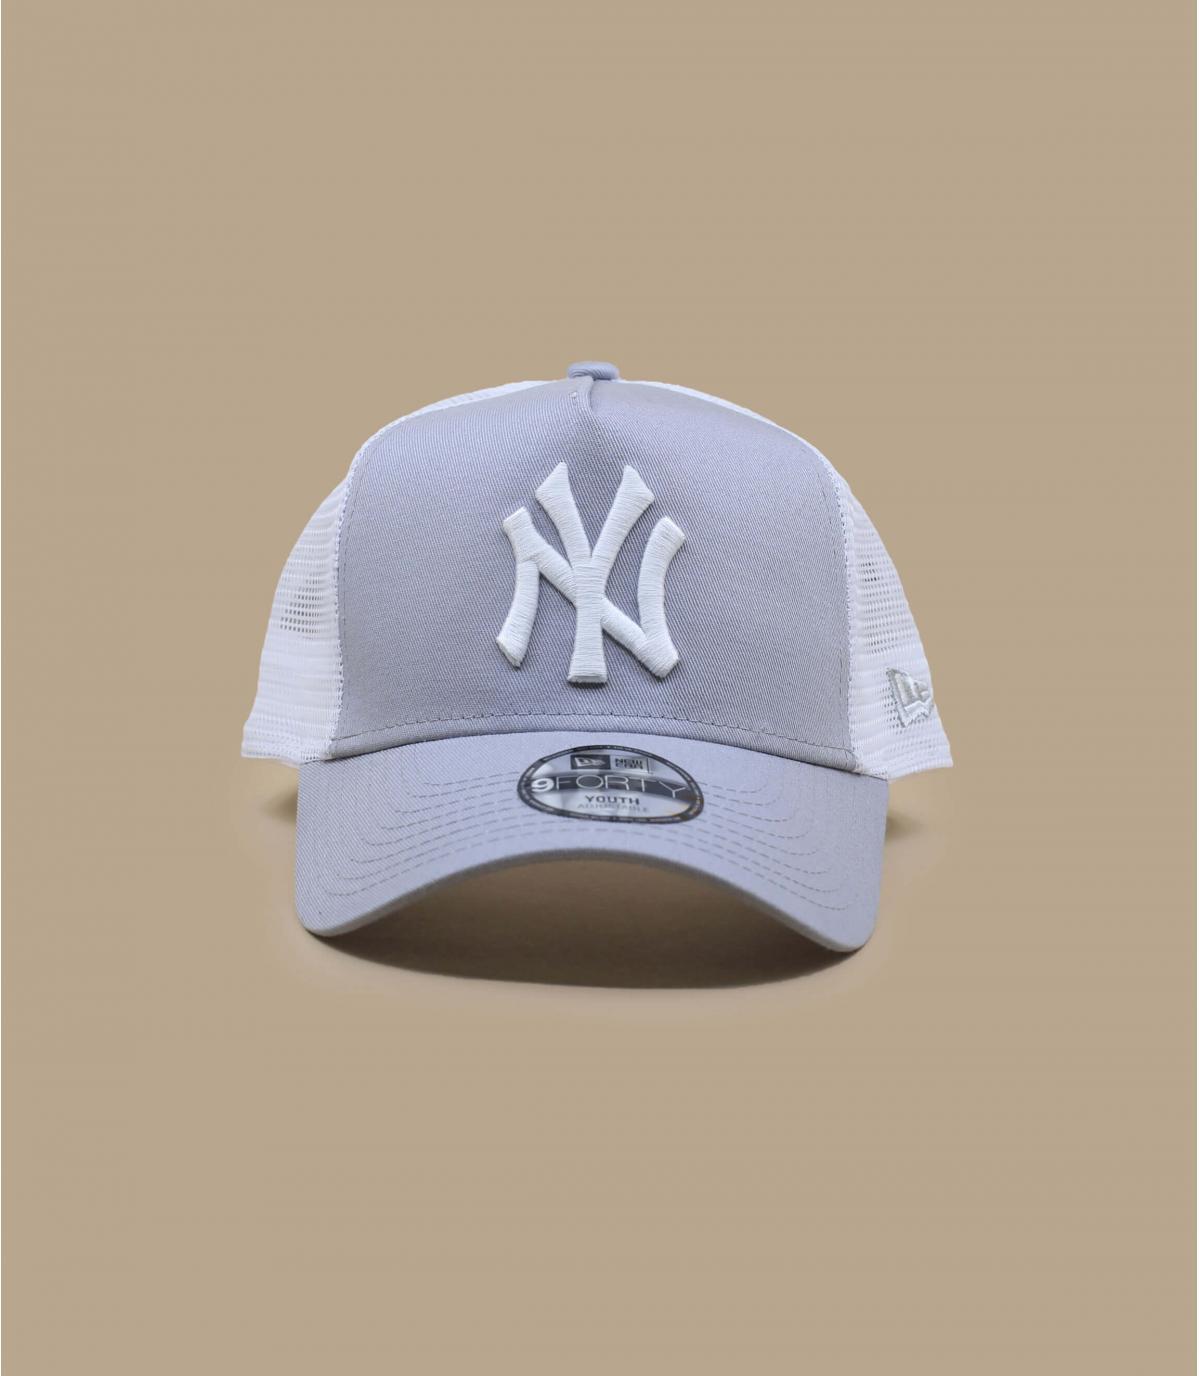 Detalles Trucker Kids NY League Ess 940 grey imagen 2